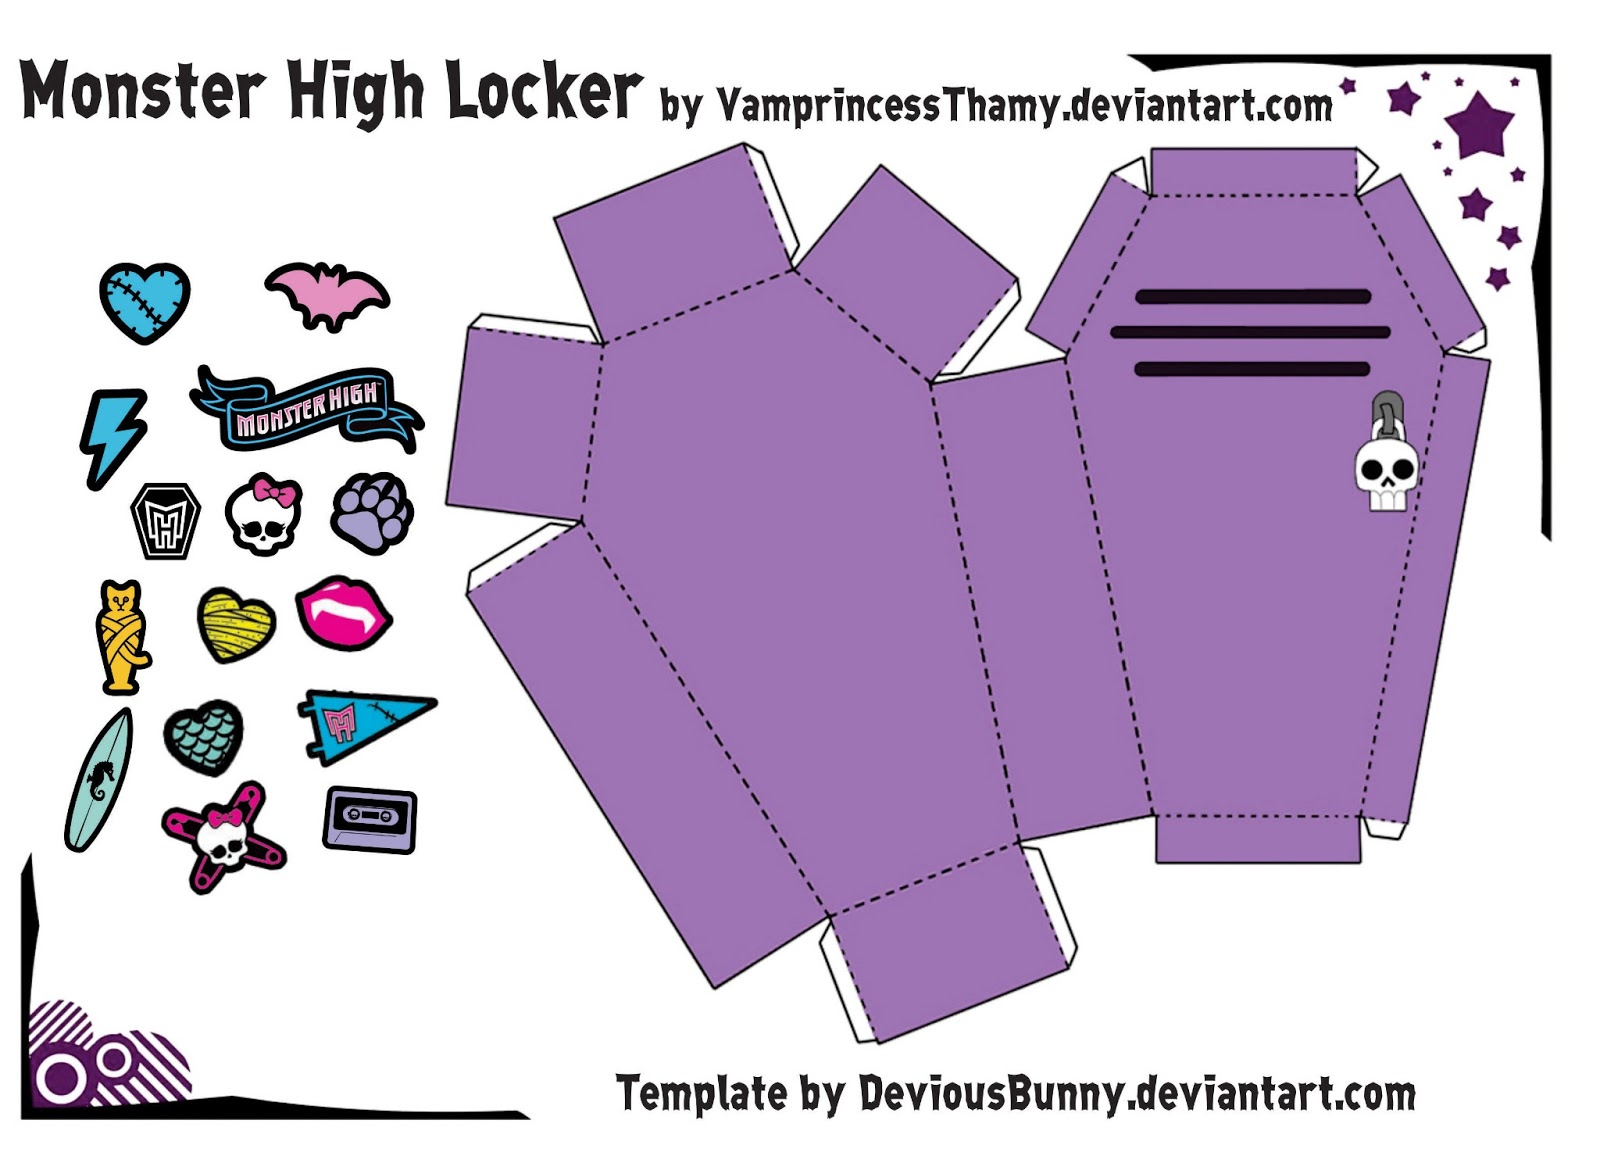 Бумажная модель - игрушка-складушка - Monster High Locker (шкафчик-гроб)